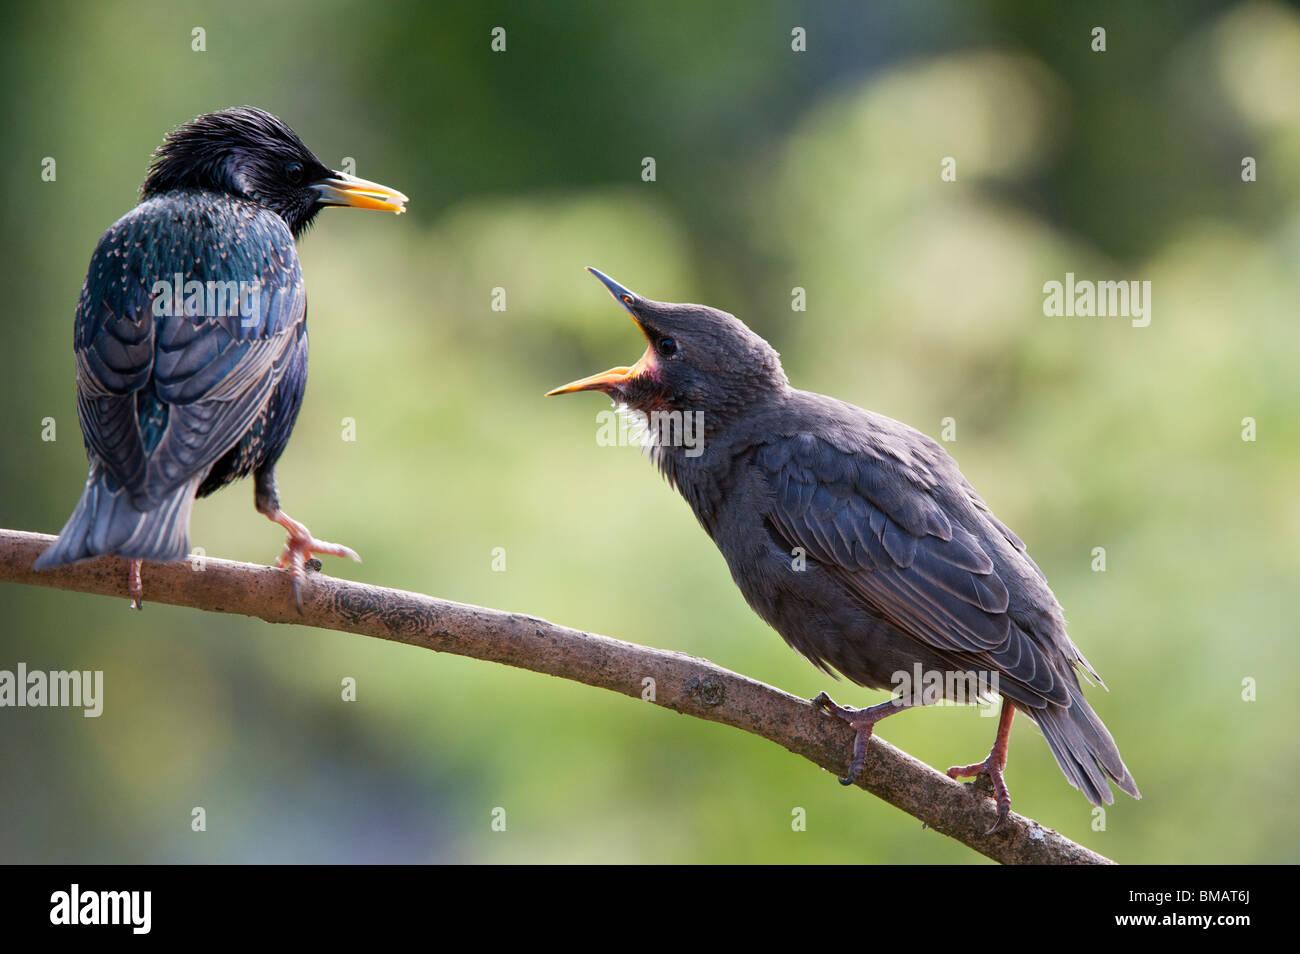 Sturnus vulgaris. Starling feeding young fledgling - Stock Image